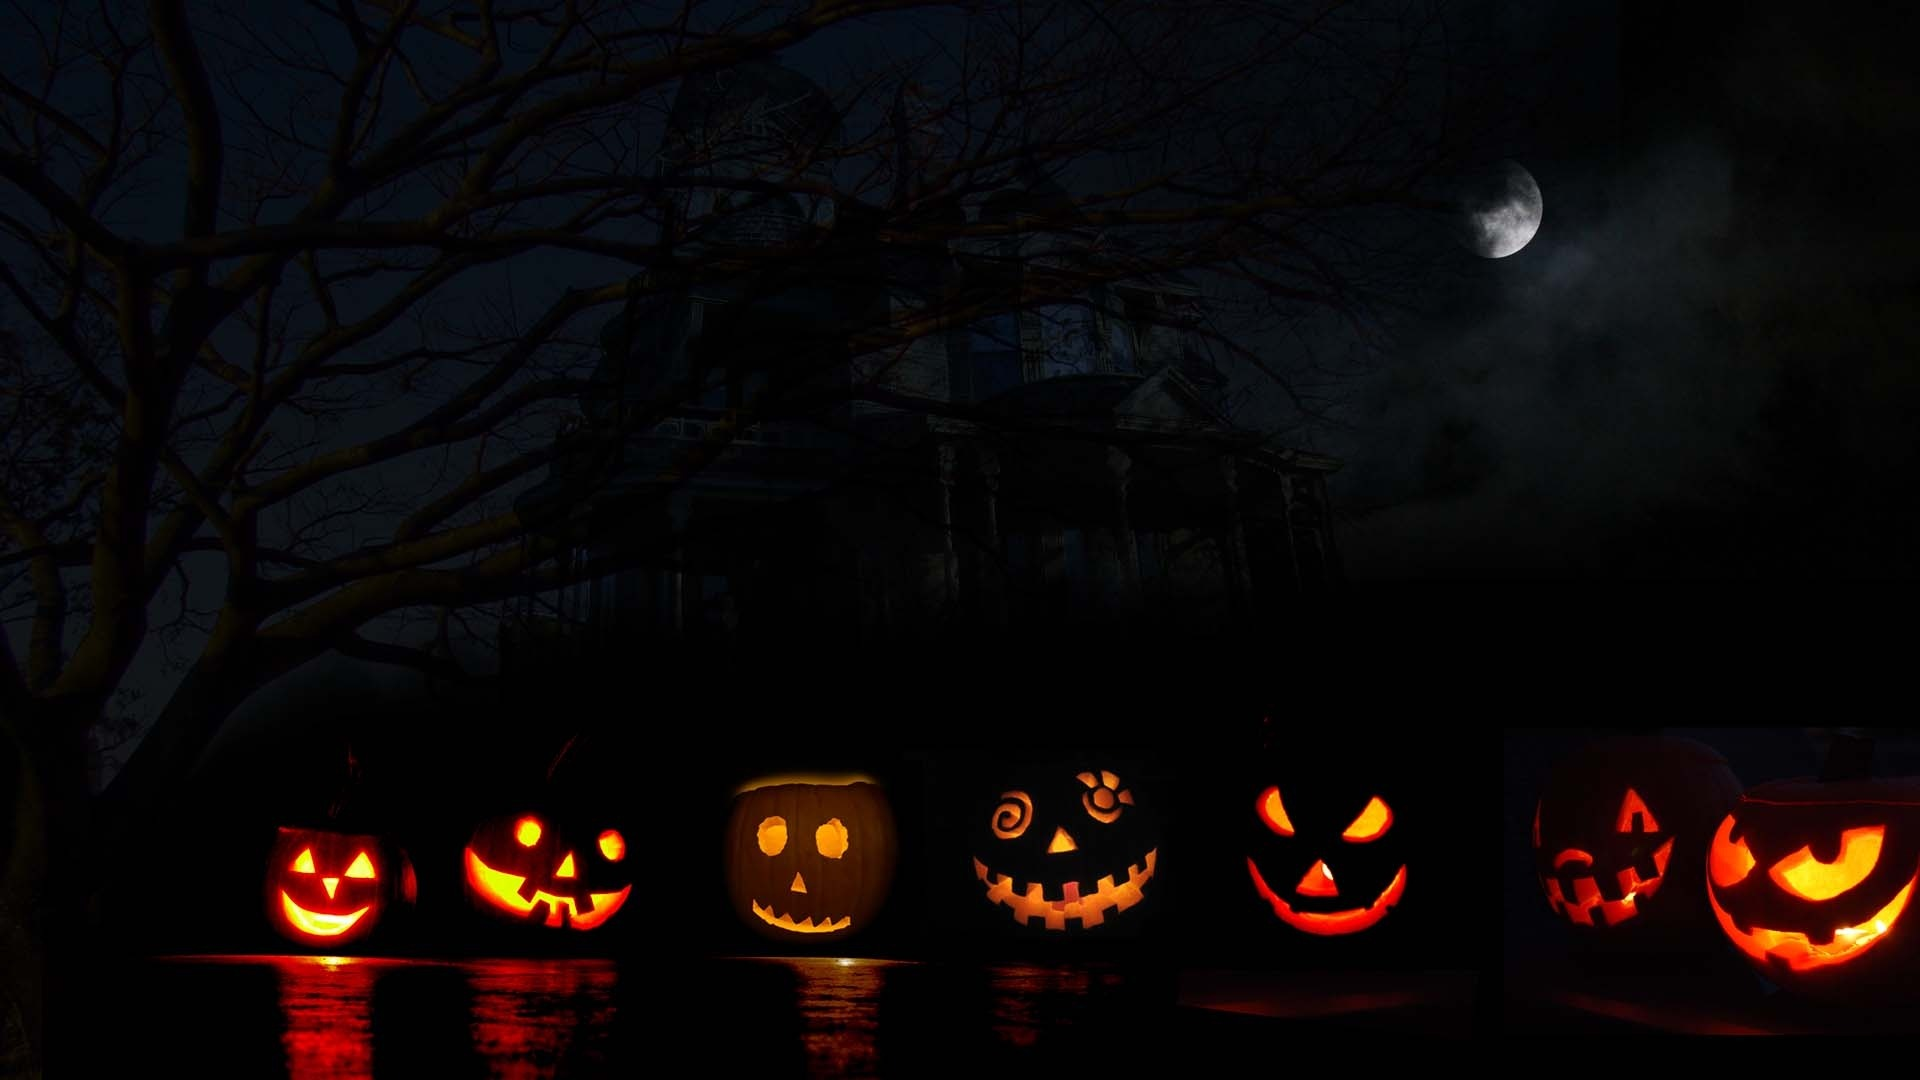 Halloween jack light happy halloween illustration design wallpaper 01